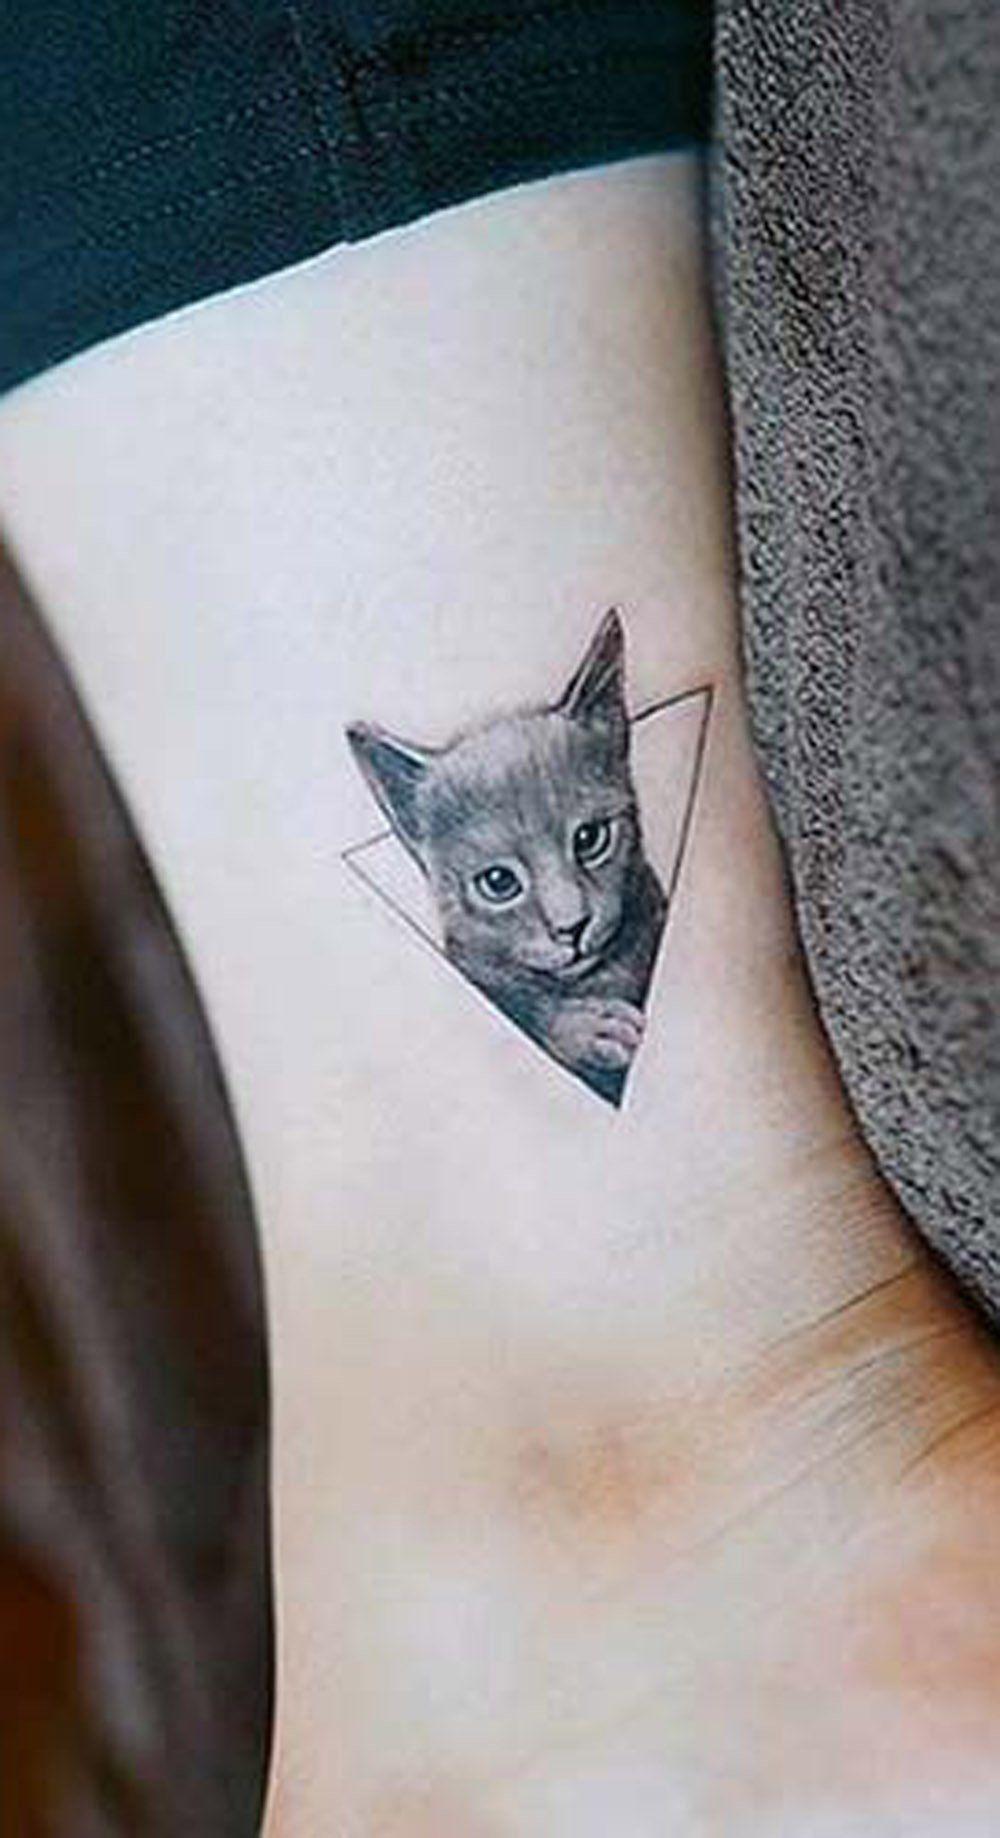 c85636ff0c0b9 Geometric Realistic Cat Portrait Ankle Leg Tattoo Ideas for Women - ideas  de tatuaje de tobillo de gato pequeño - www.MyBodiArt.com